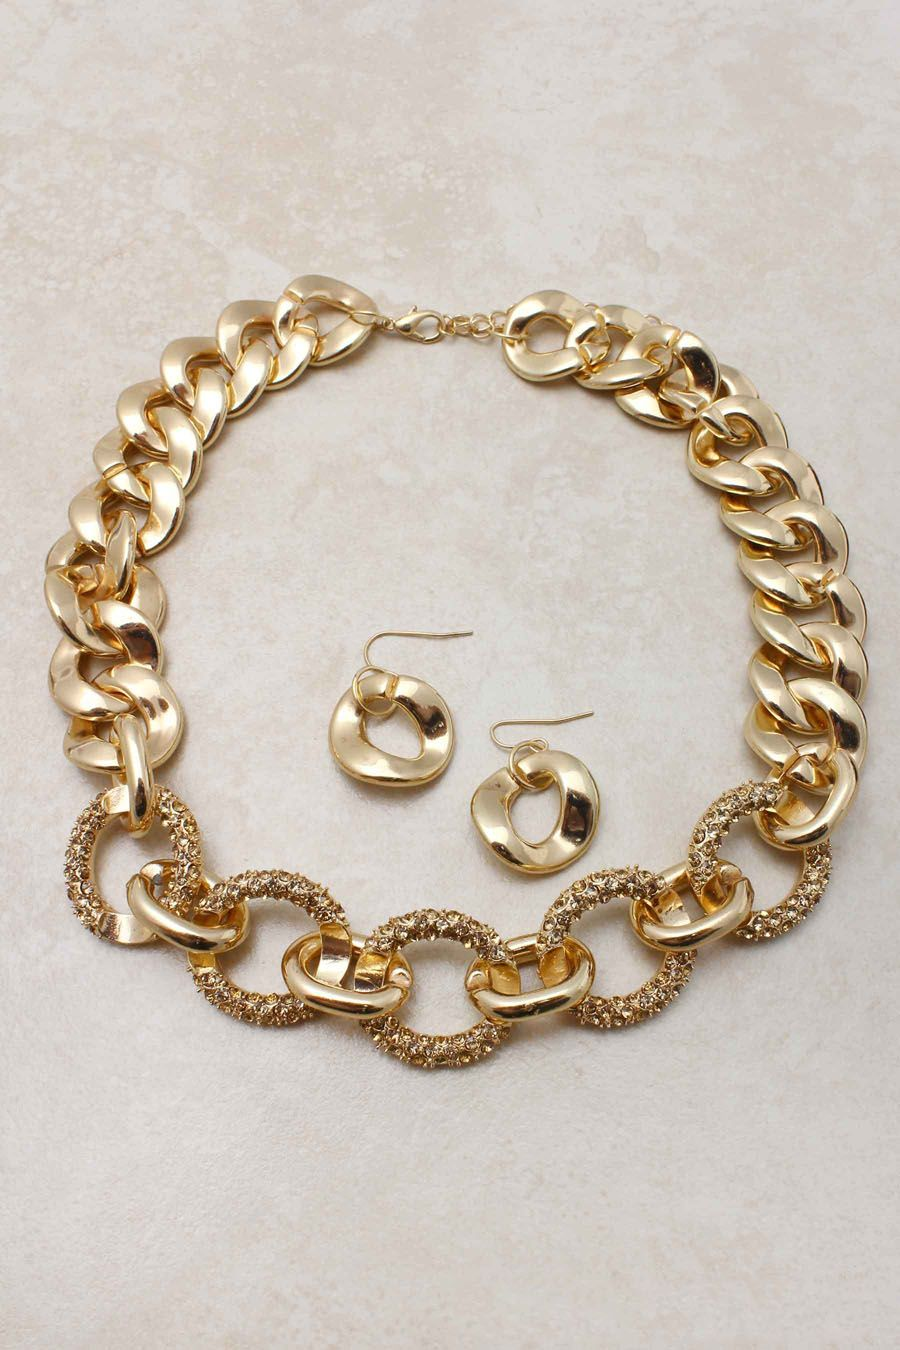 Champagne Jillian Necklace Set | Jewelry | Pinterest | Champagne ...